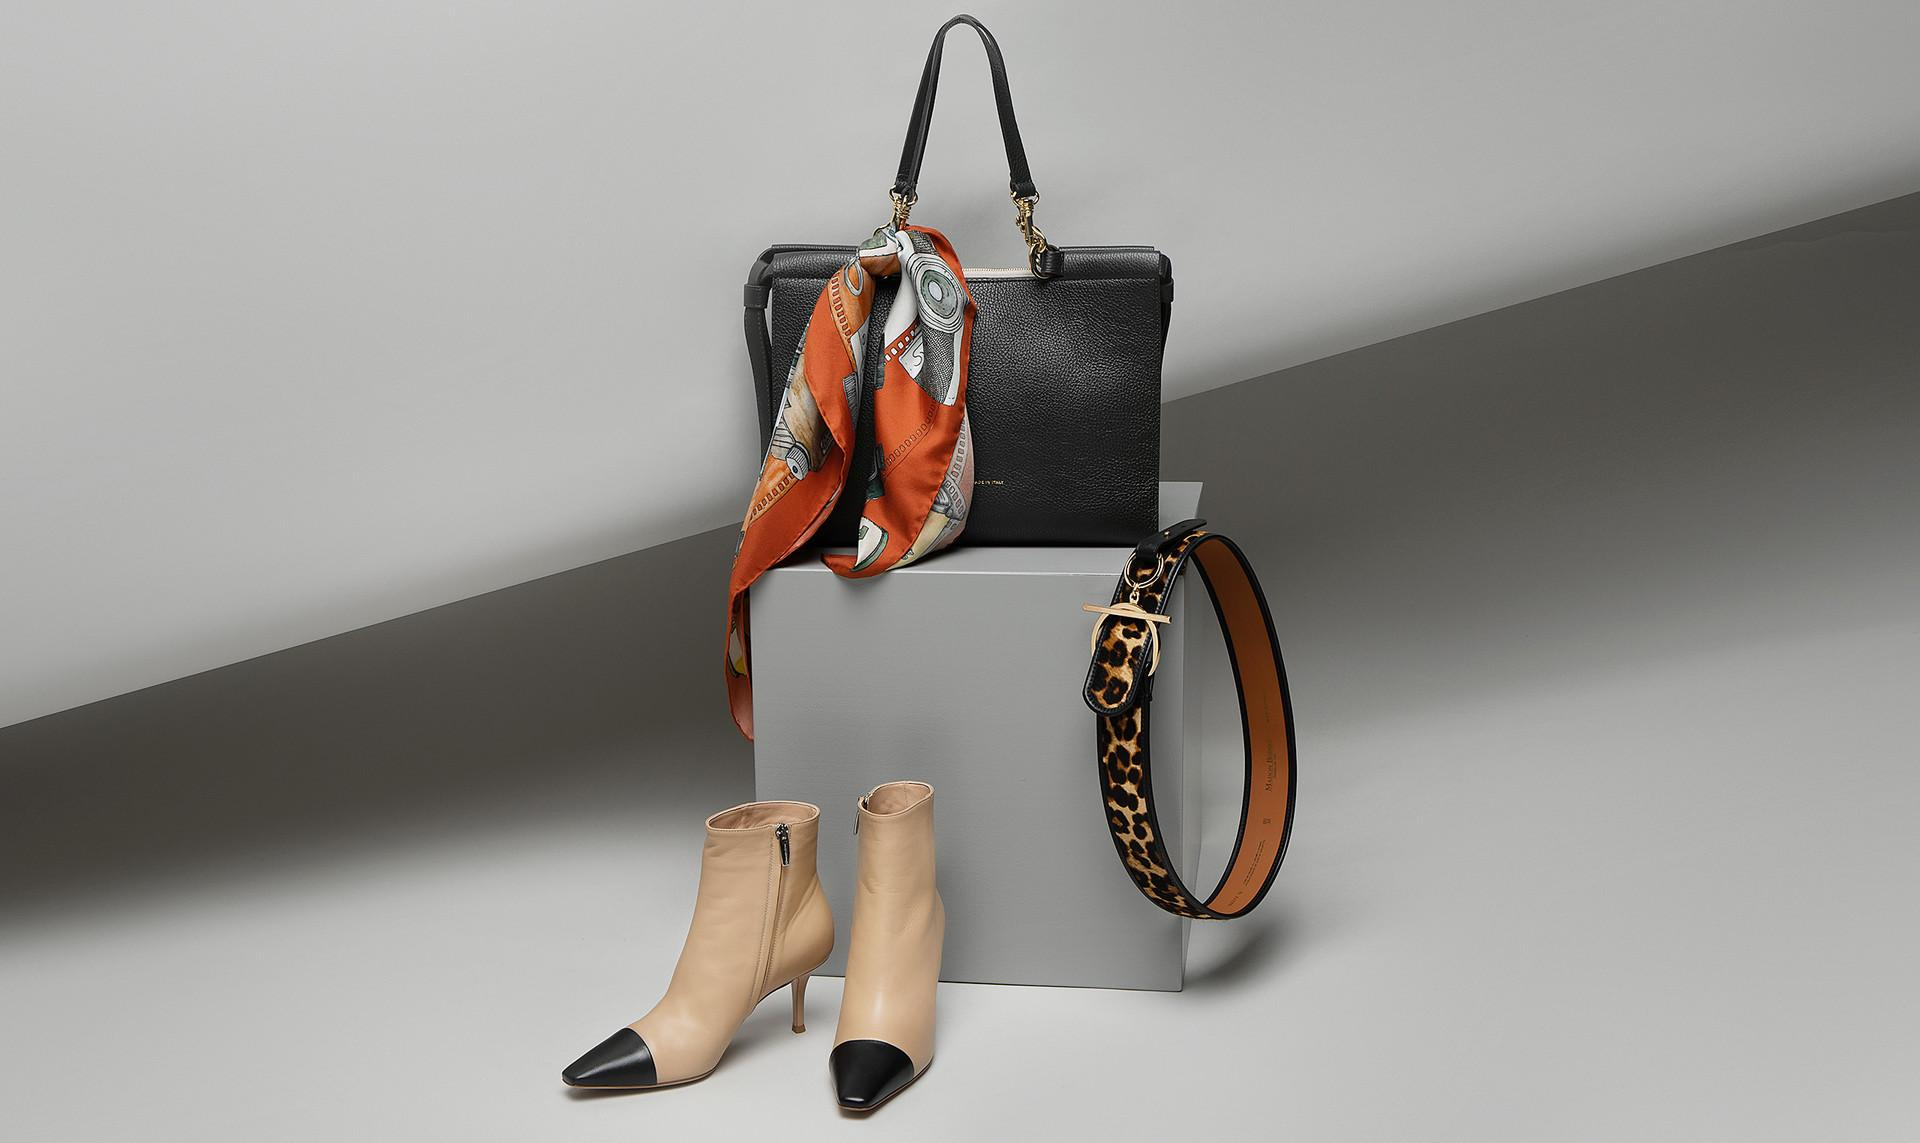 ESTNATION for Women Shoes & others selection